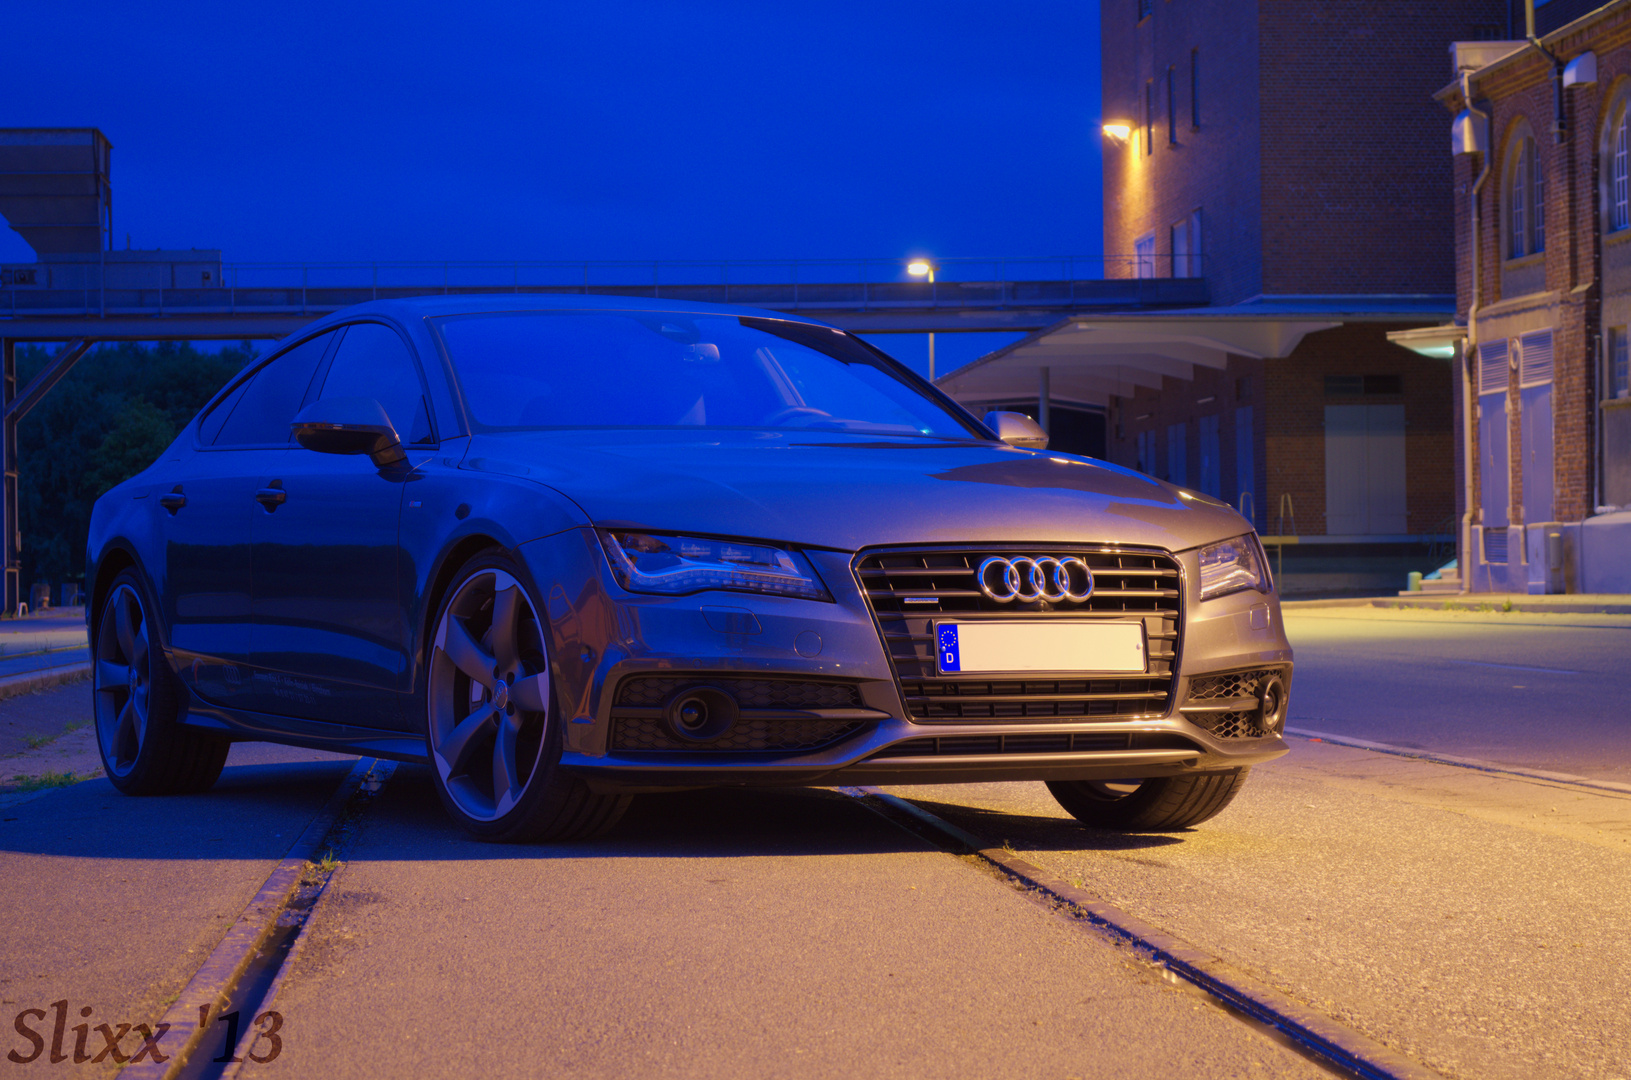 Audi A7 in Farbe